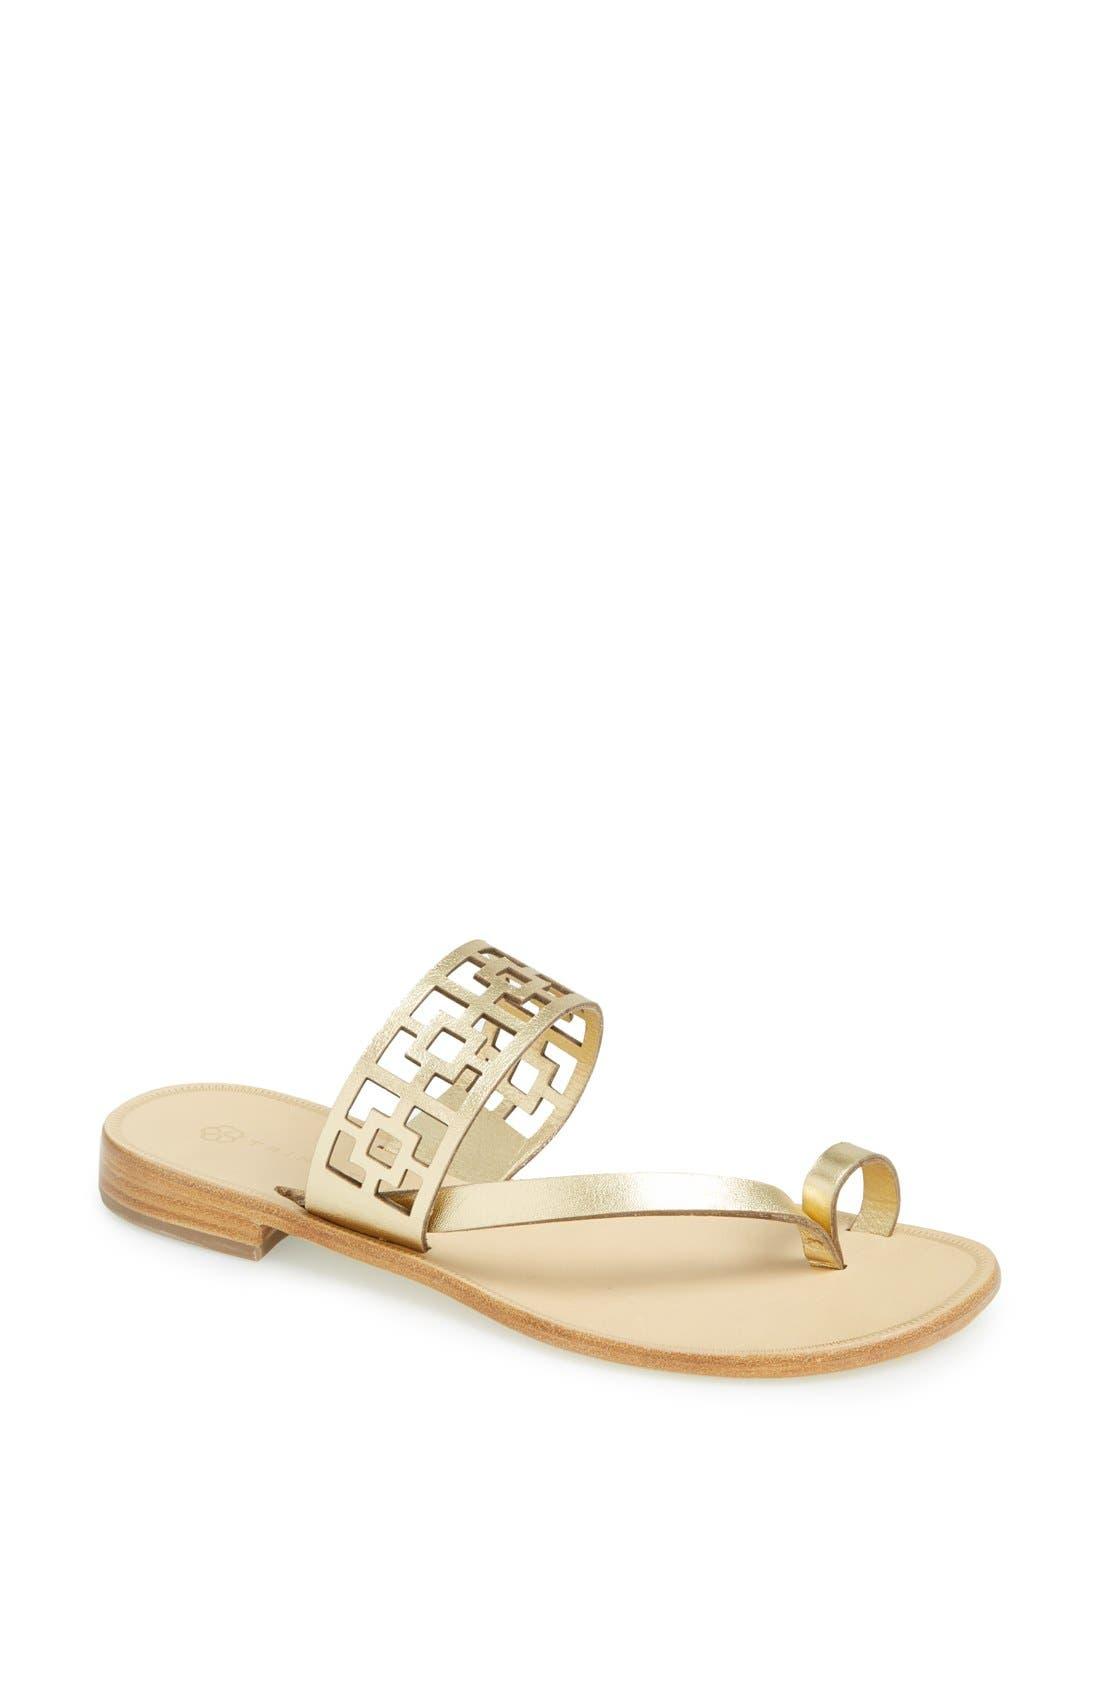 Main Image - Trina Turk 'Brentwood' Sandal